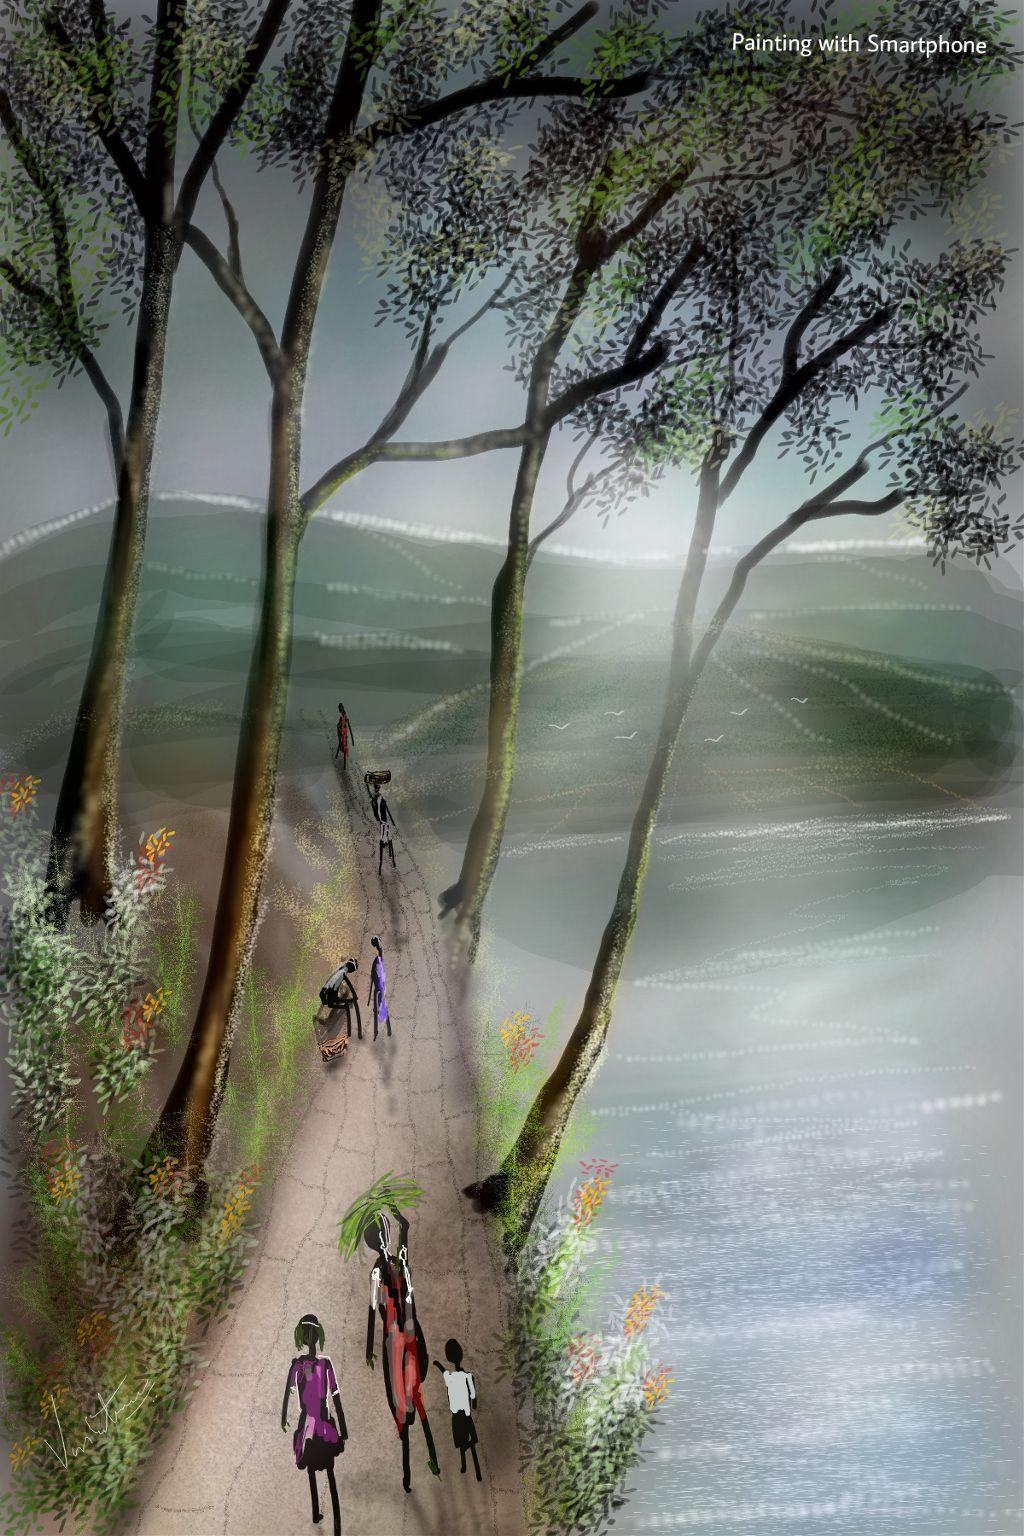 #drawing #share #nature #love #enjoy #life